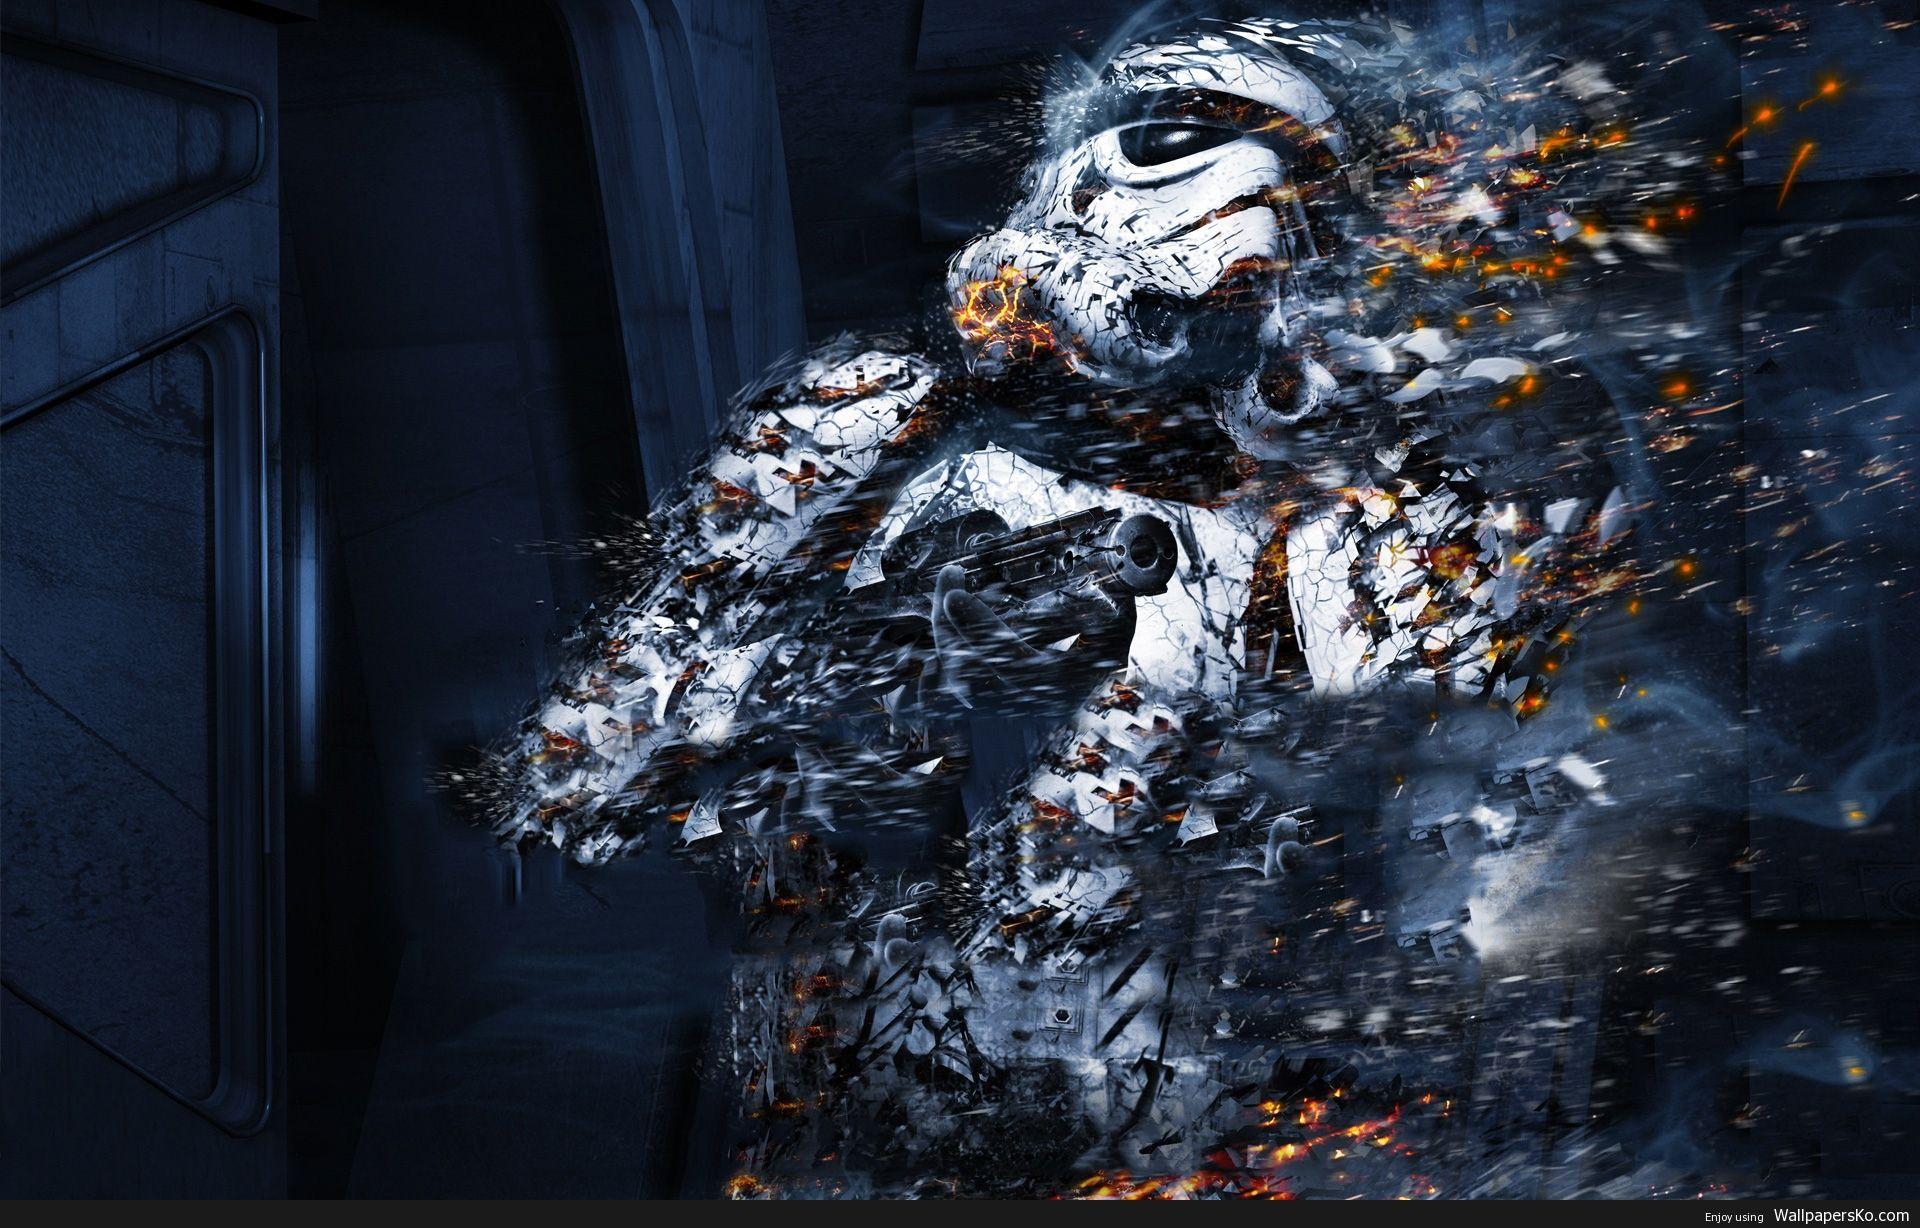 stormtrooper wallpaper 1920x1080 - http://wallpapersko